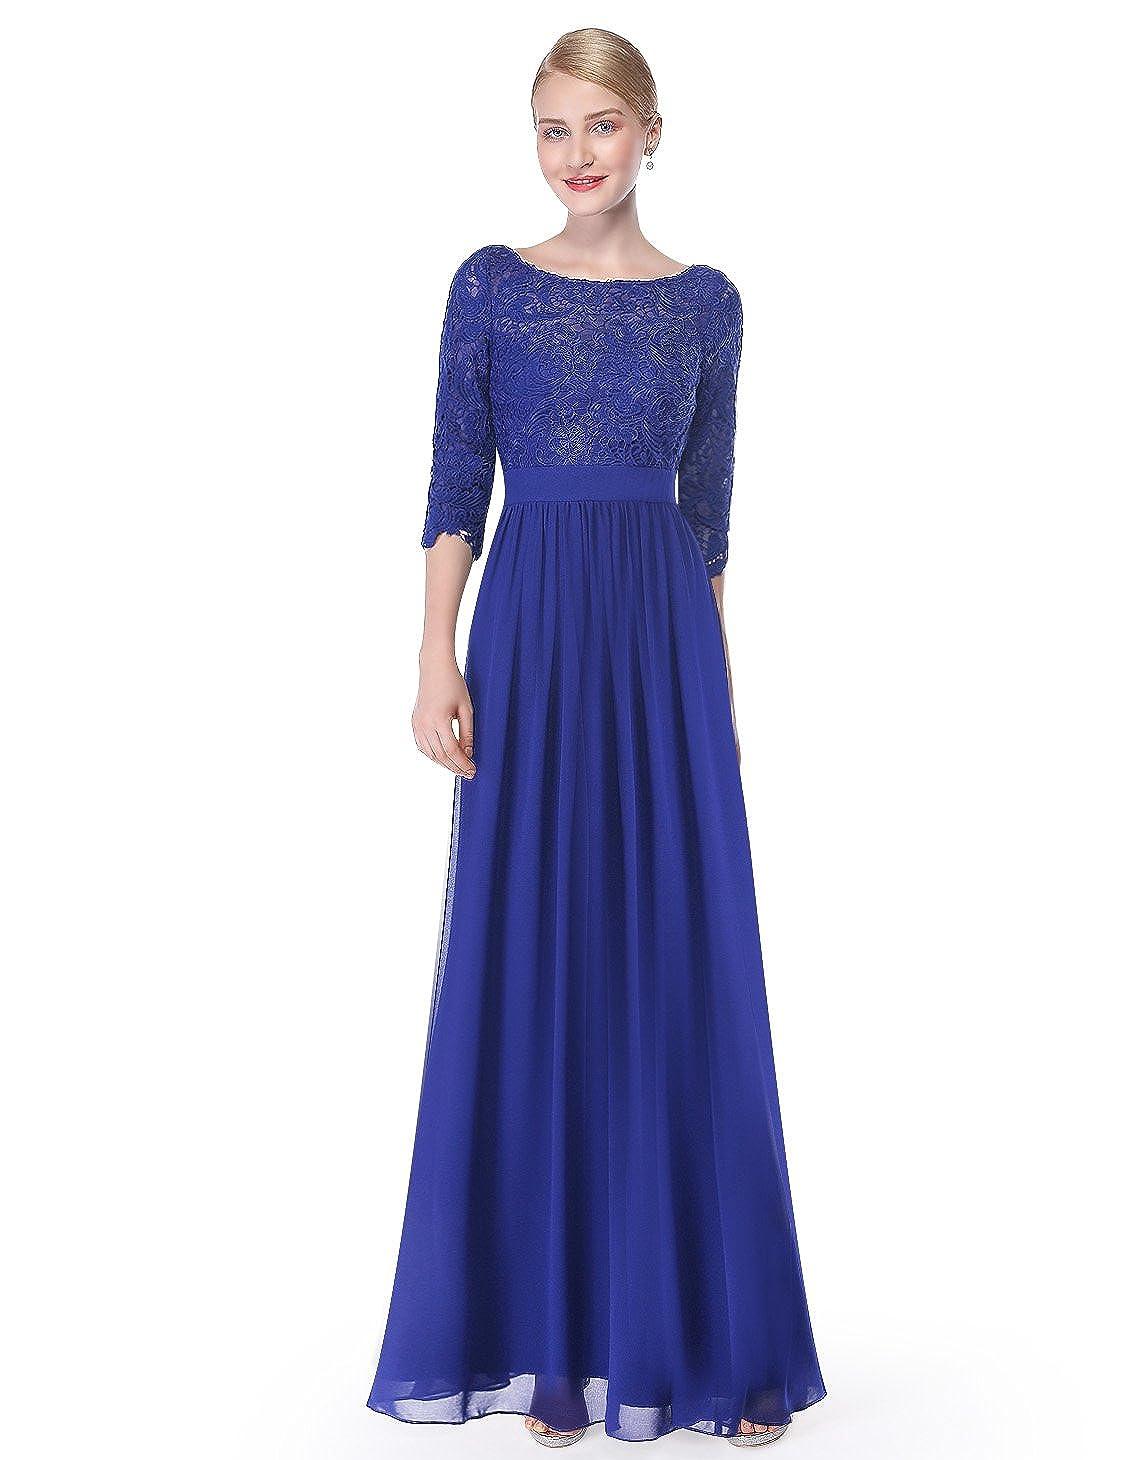 3ad39da94e8d Ever-Pretty Women s Lace Long Sleeve Floor Length Evening Dress 08412 at  Amazon Women s Clothing store